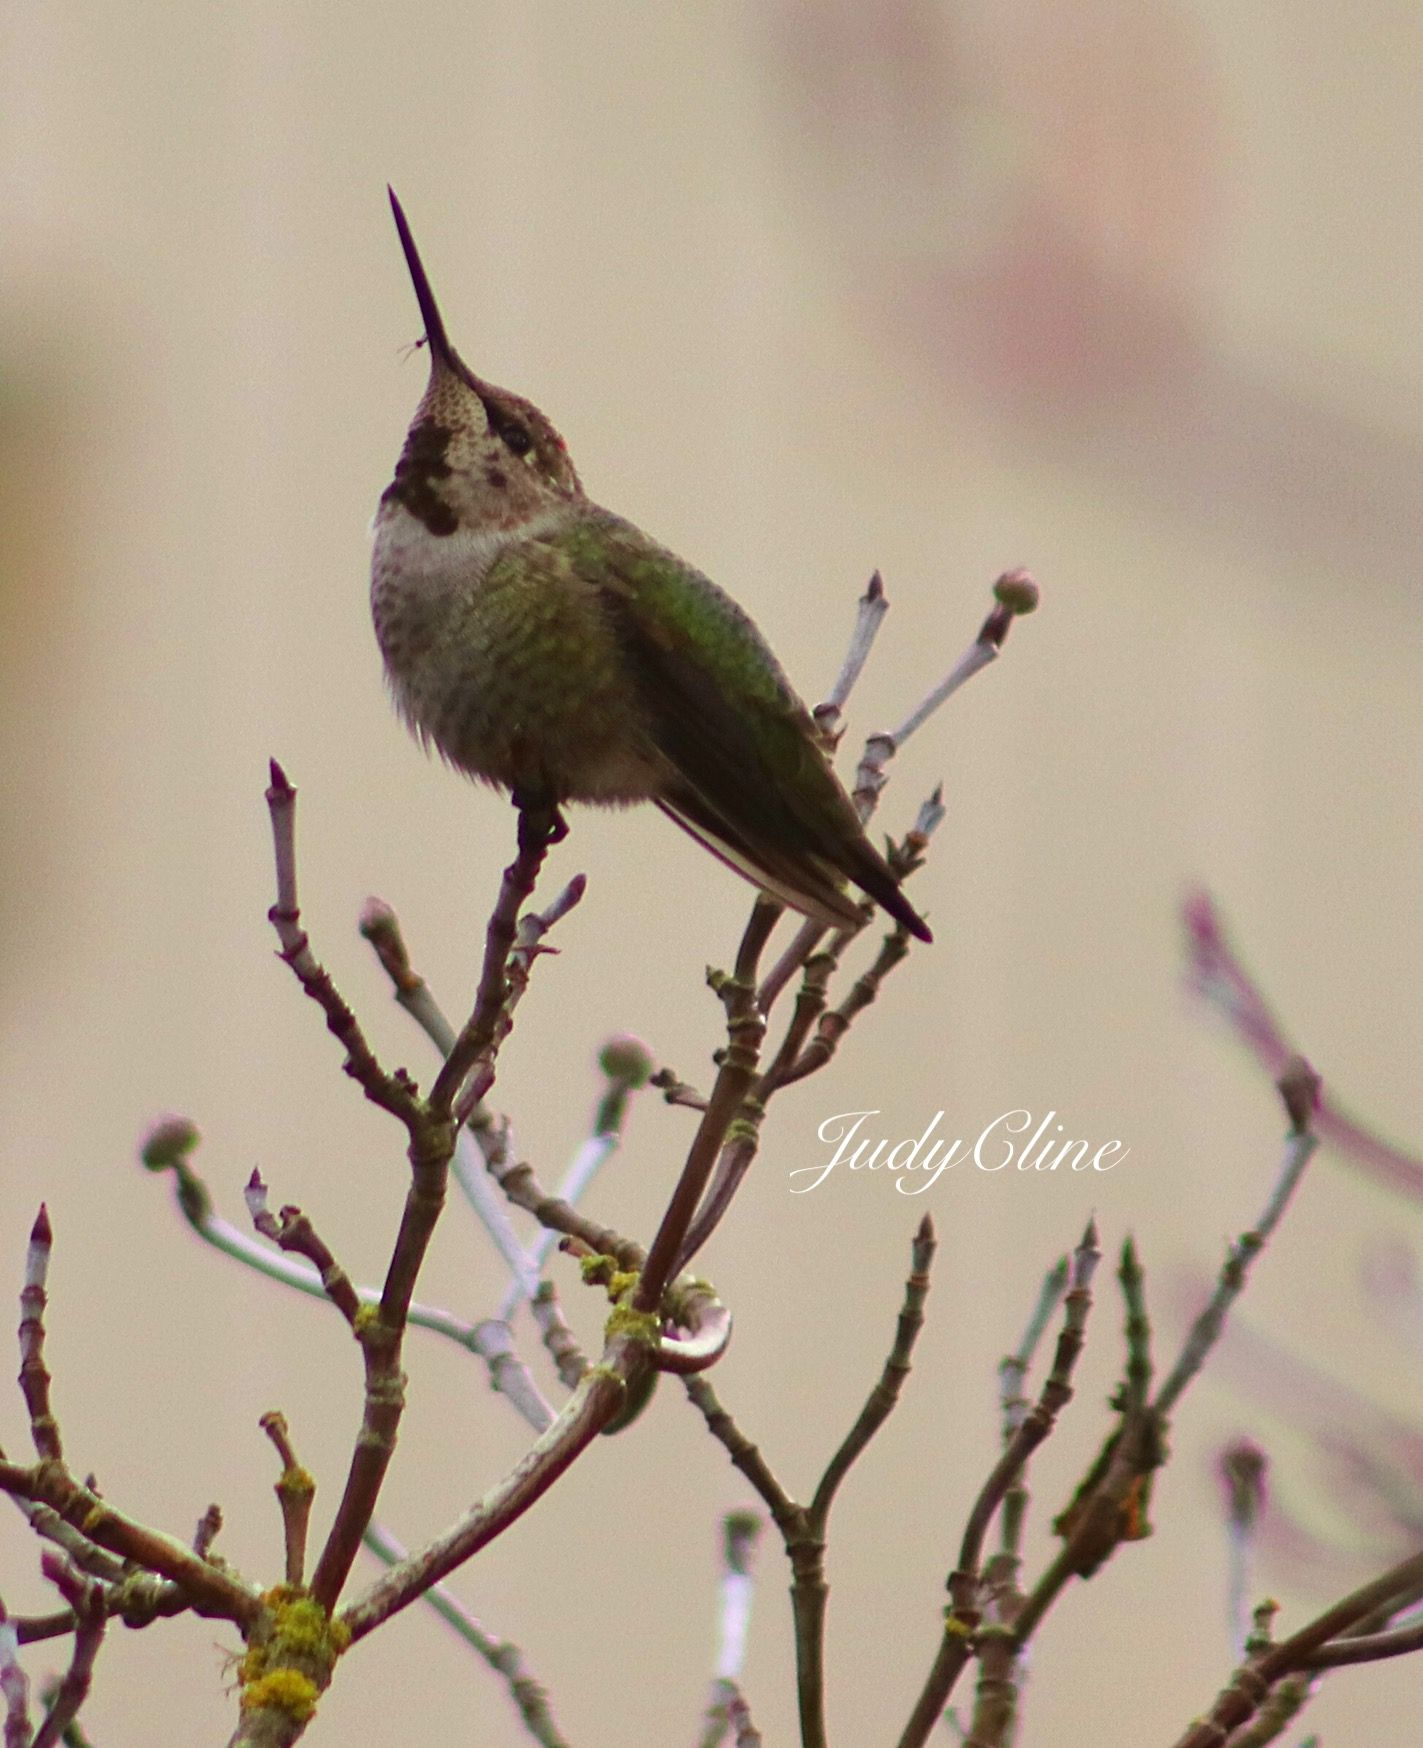 Anna S Hummingbird Washington State Judycline 11 5